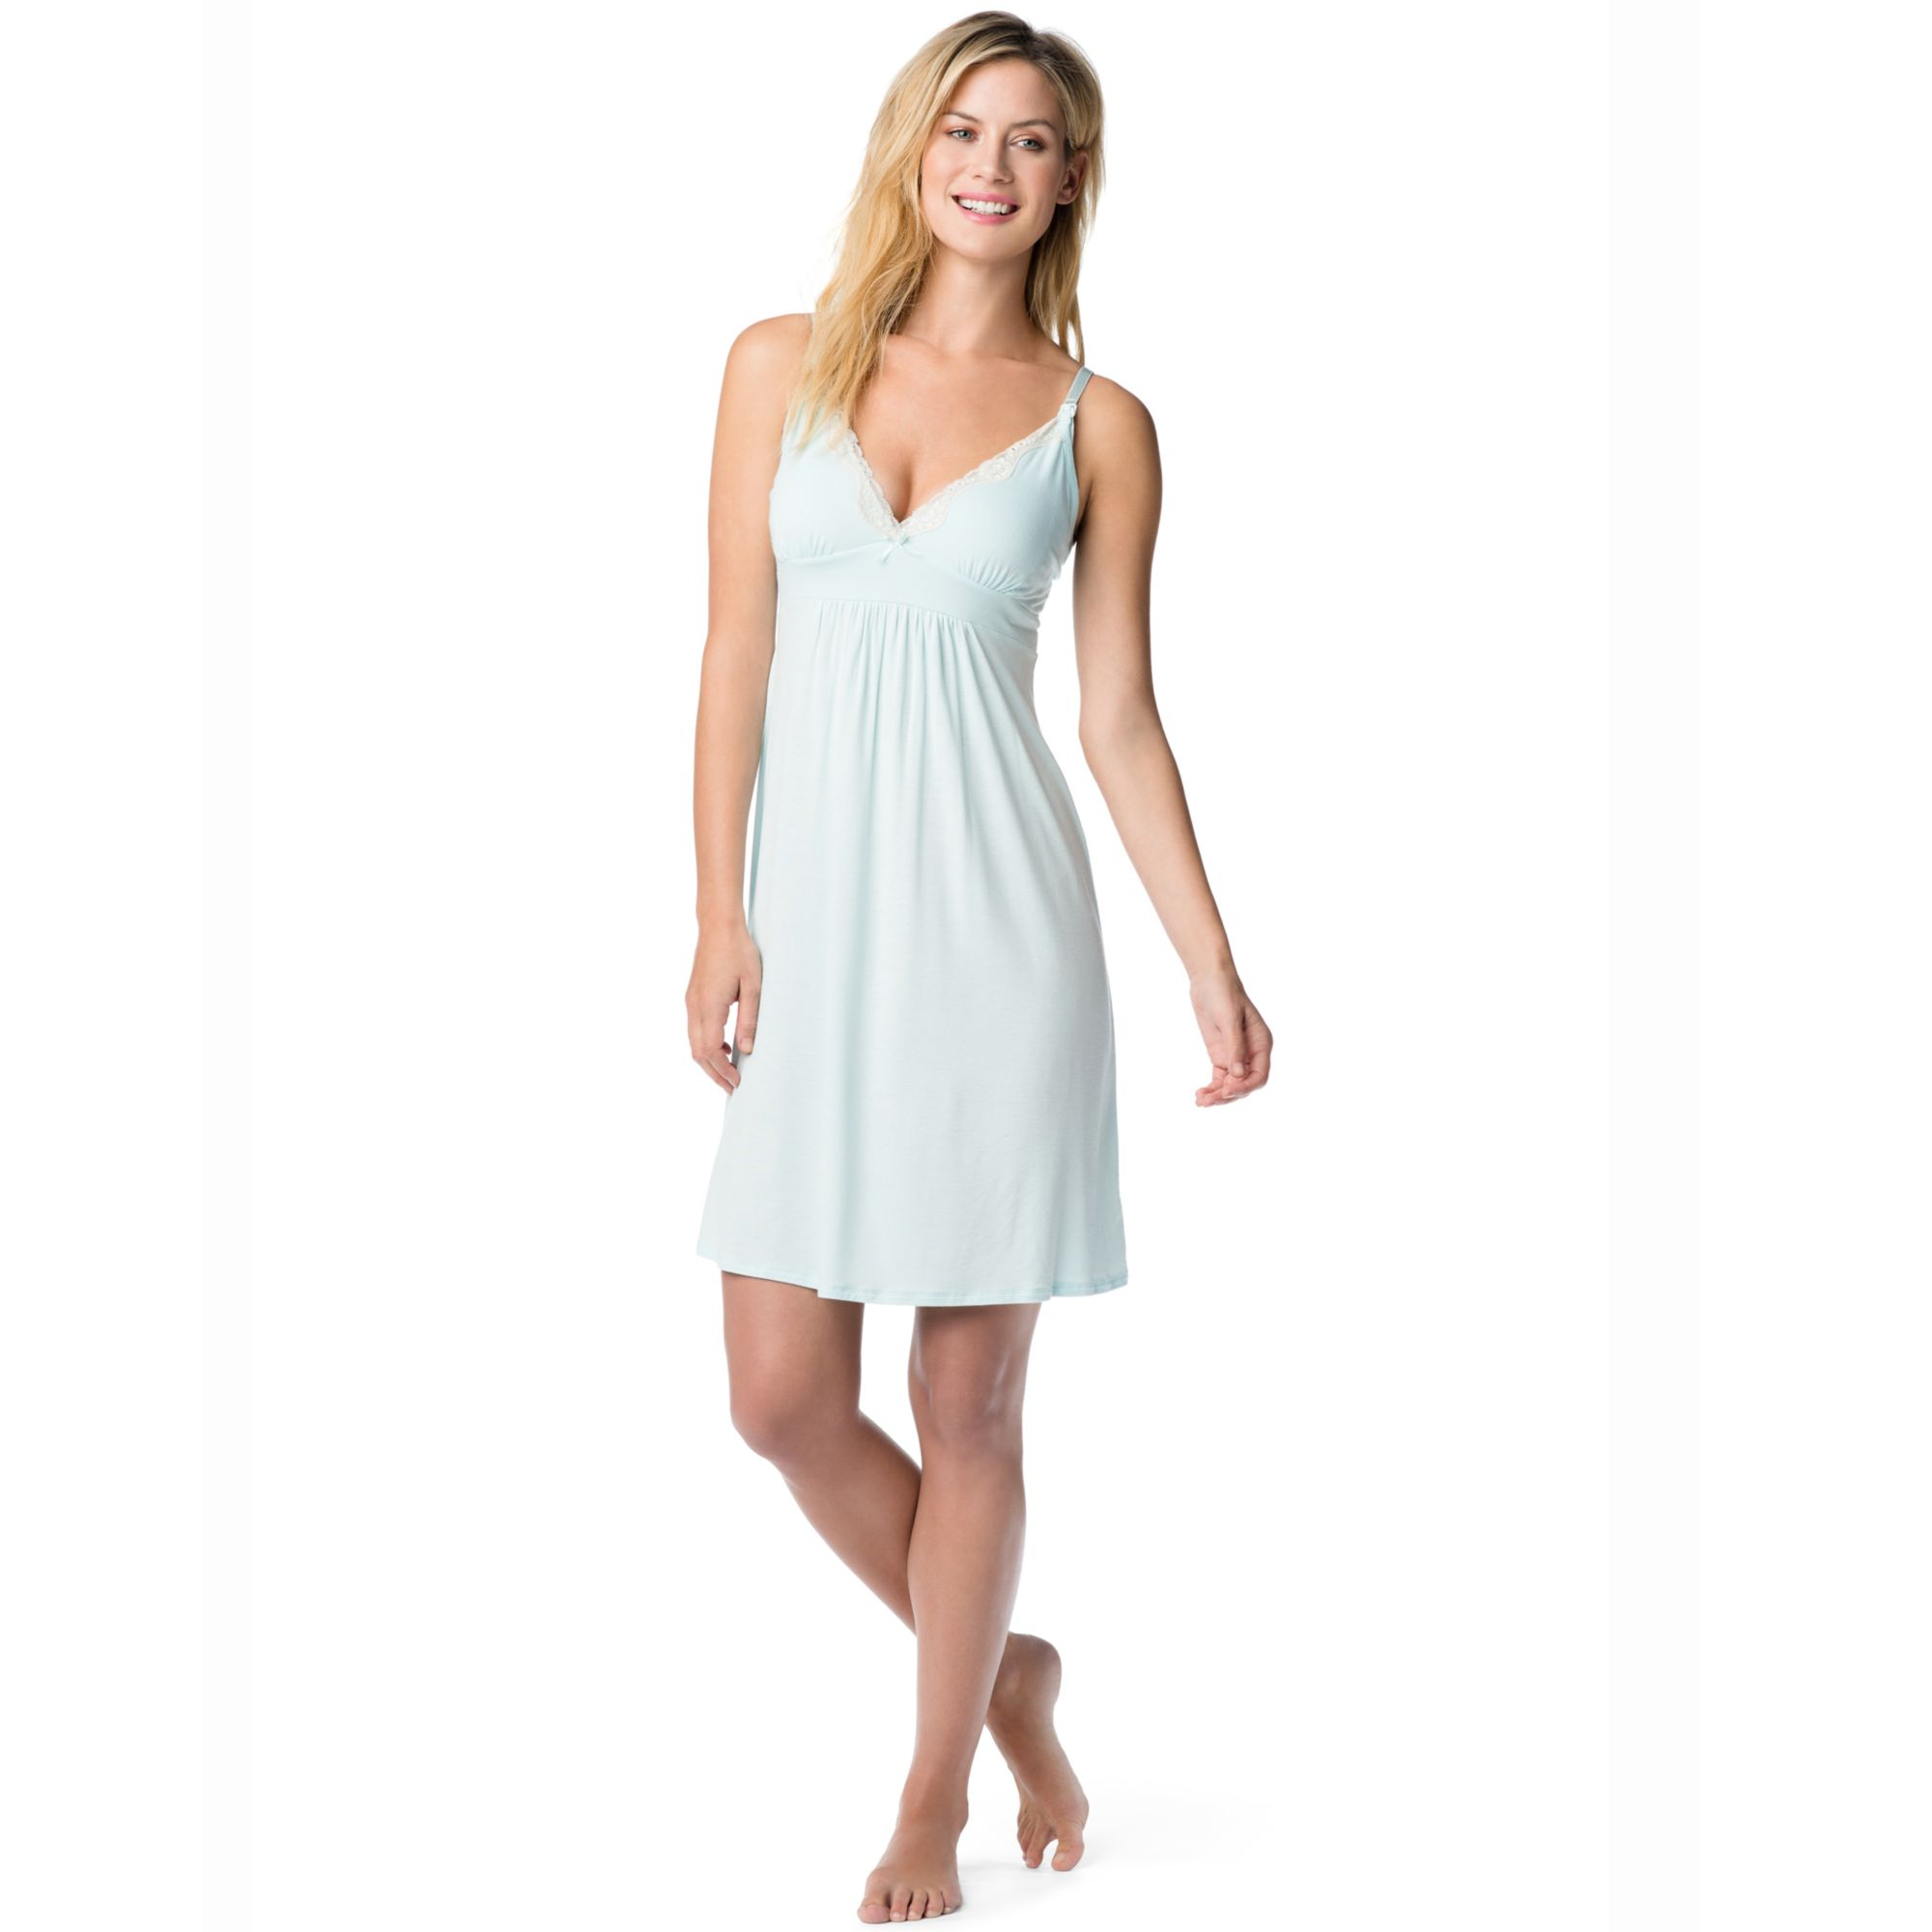 Lyst - Jessica Simpson Maternity Twopiece Nursing Nightgown Set in Blue